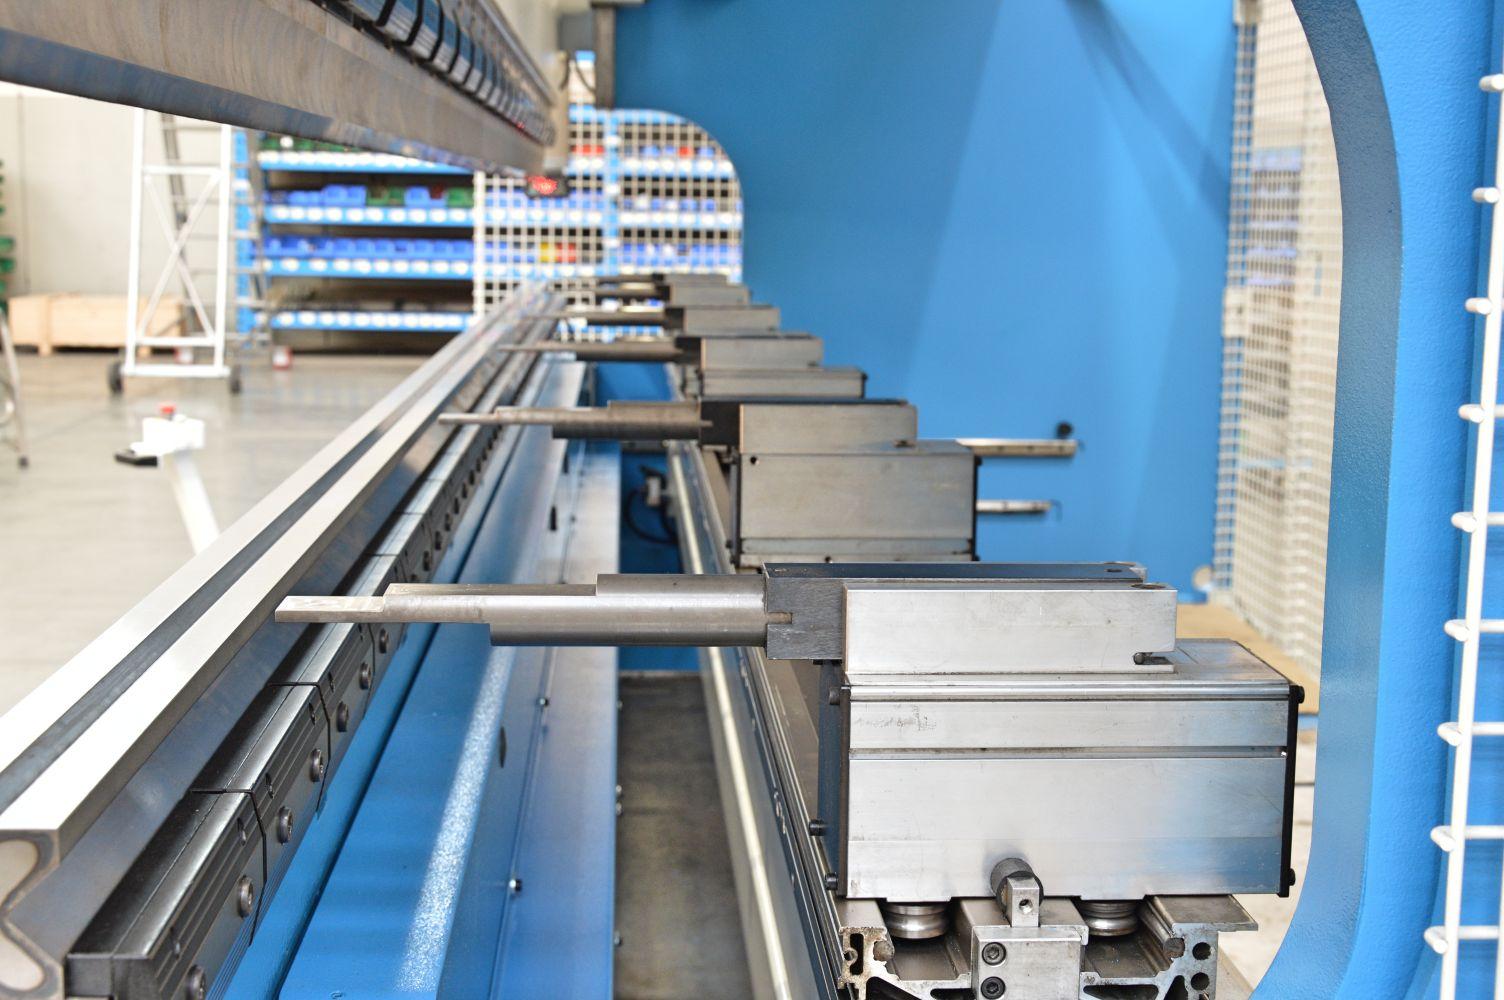 mantenimiento reequipamiento tope trasero prensa plegadora